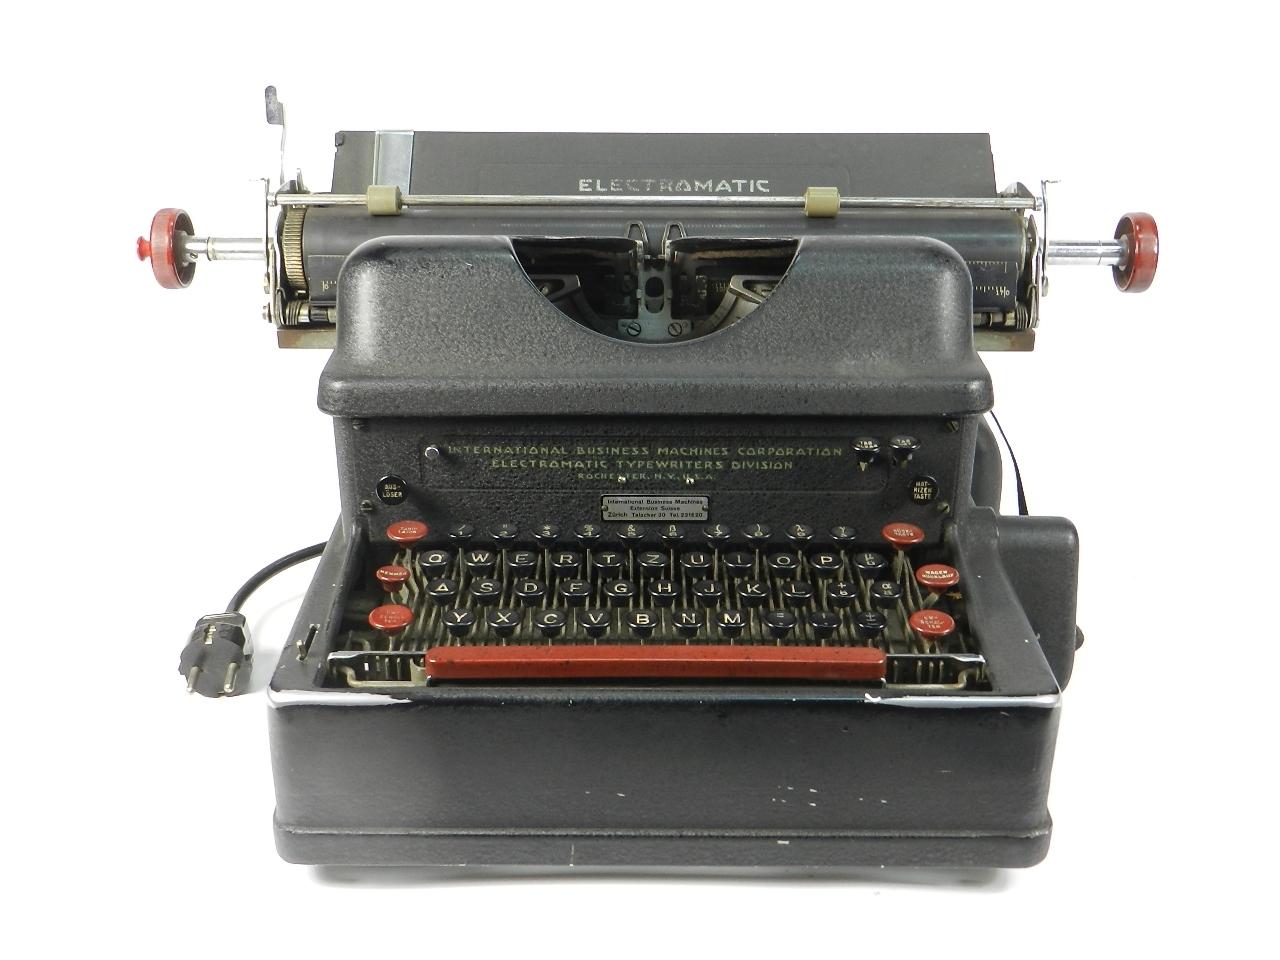 Imagen IBM ELECTROMATIC AÑO 1935 40288